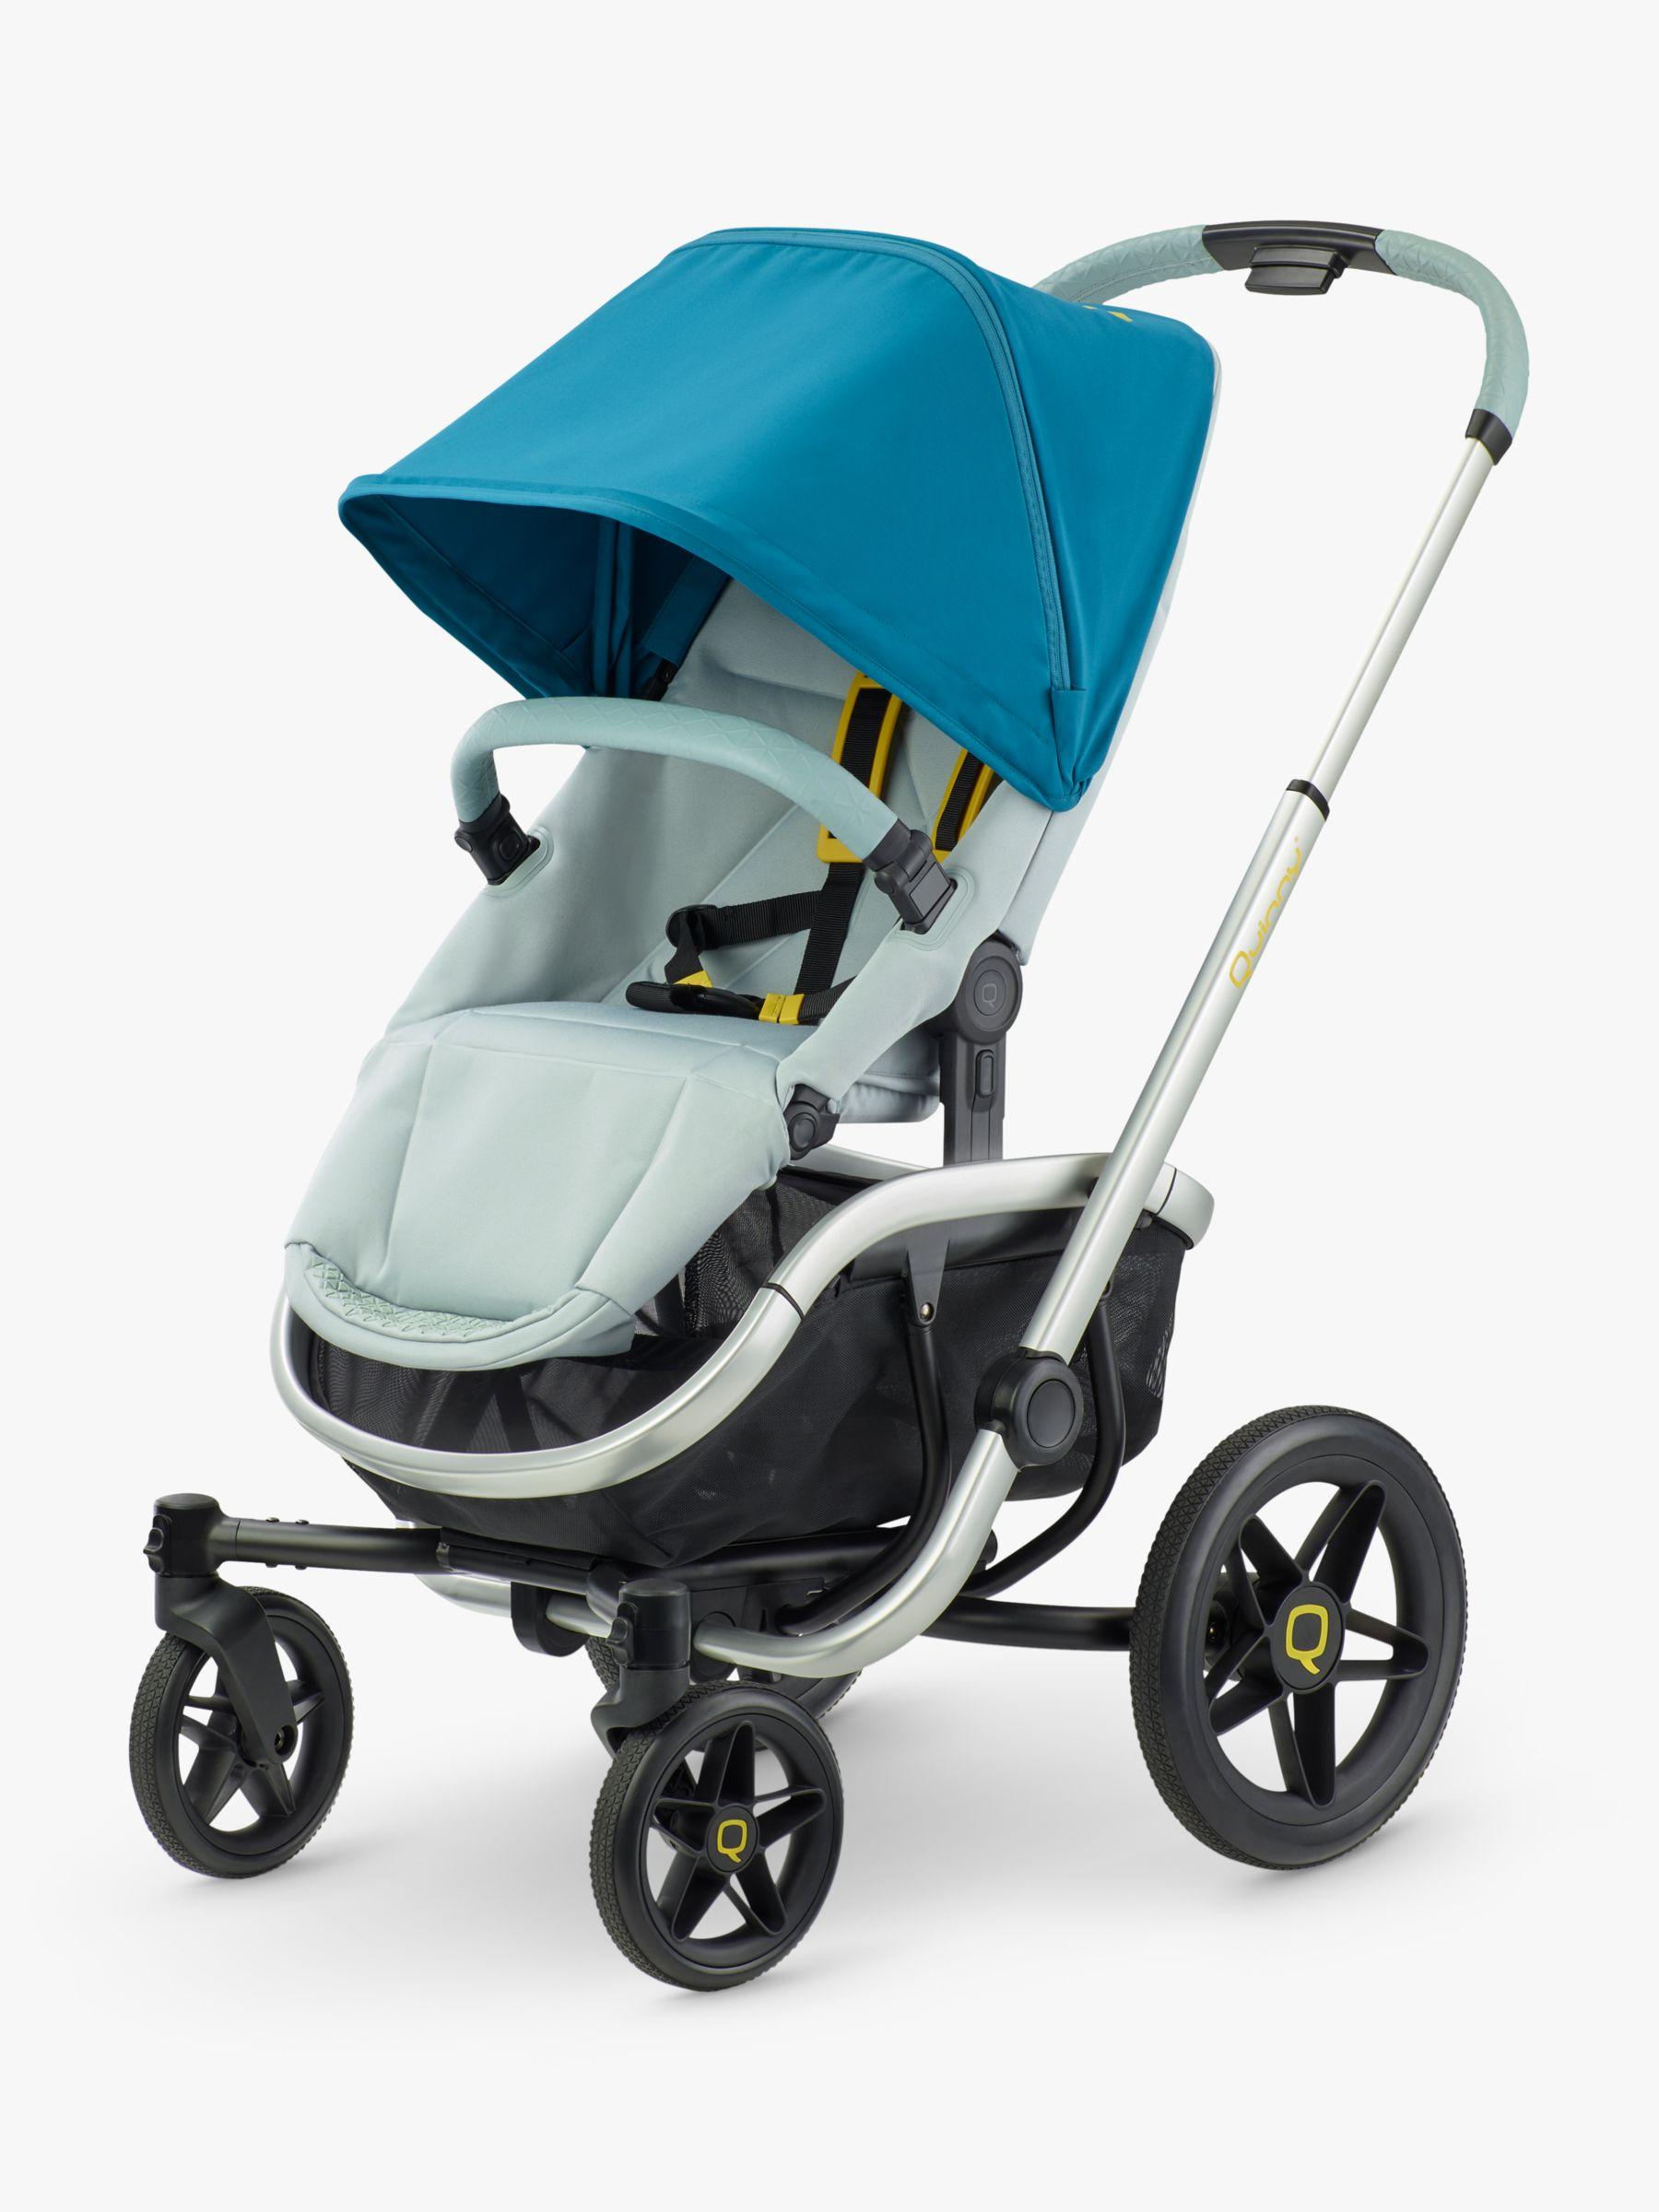 Quinny Quinny VNC Pushchair, Grey/Blue